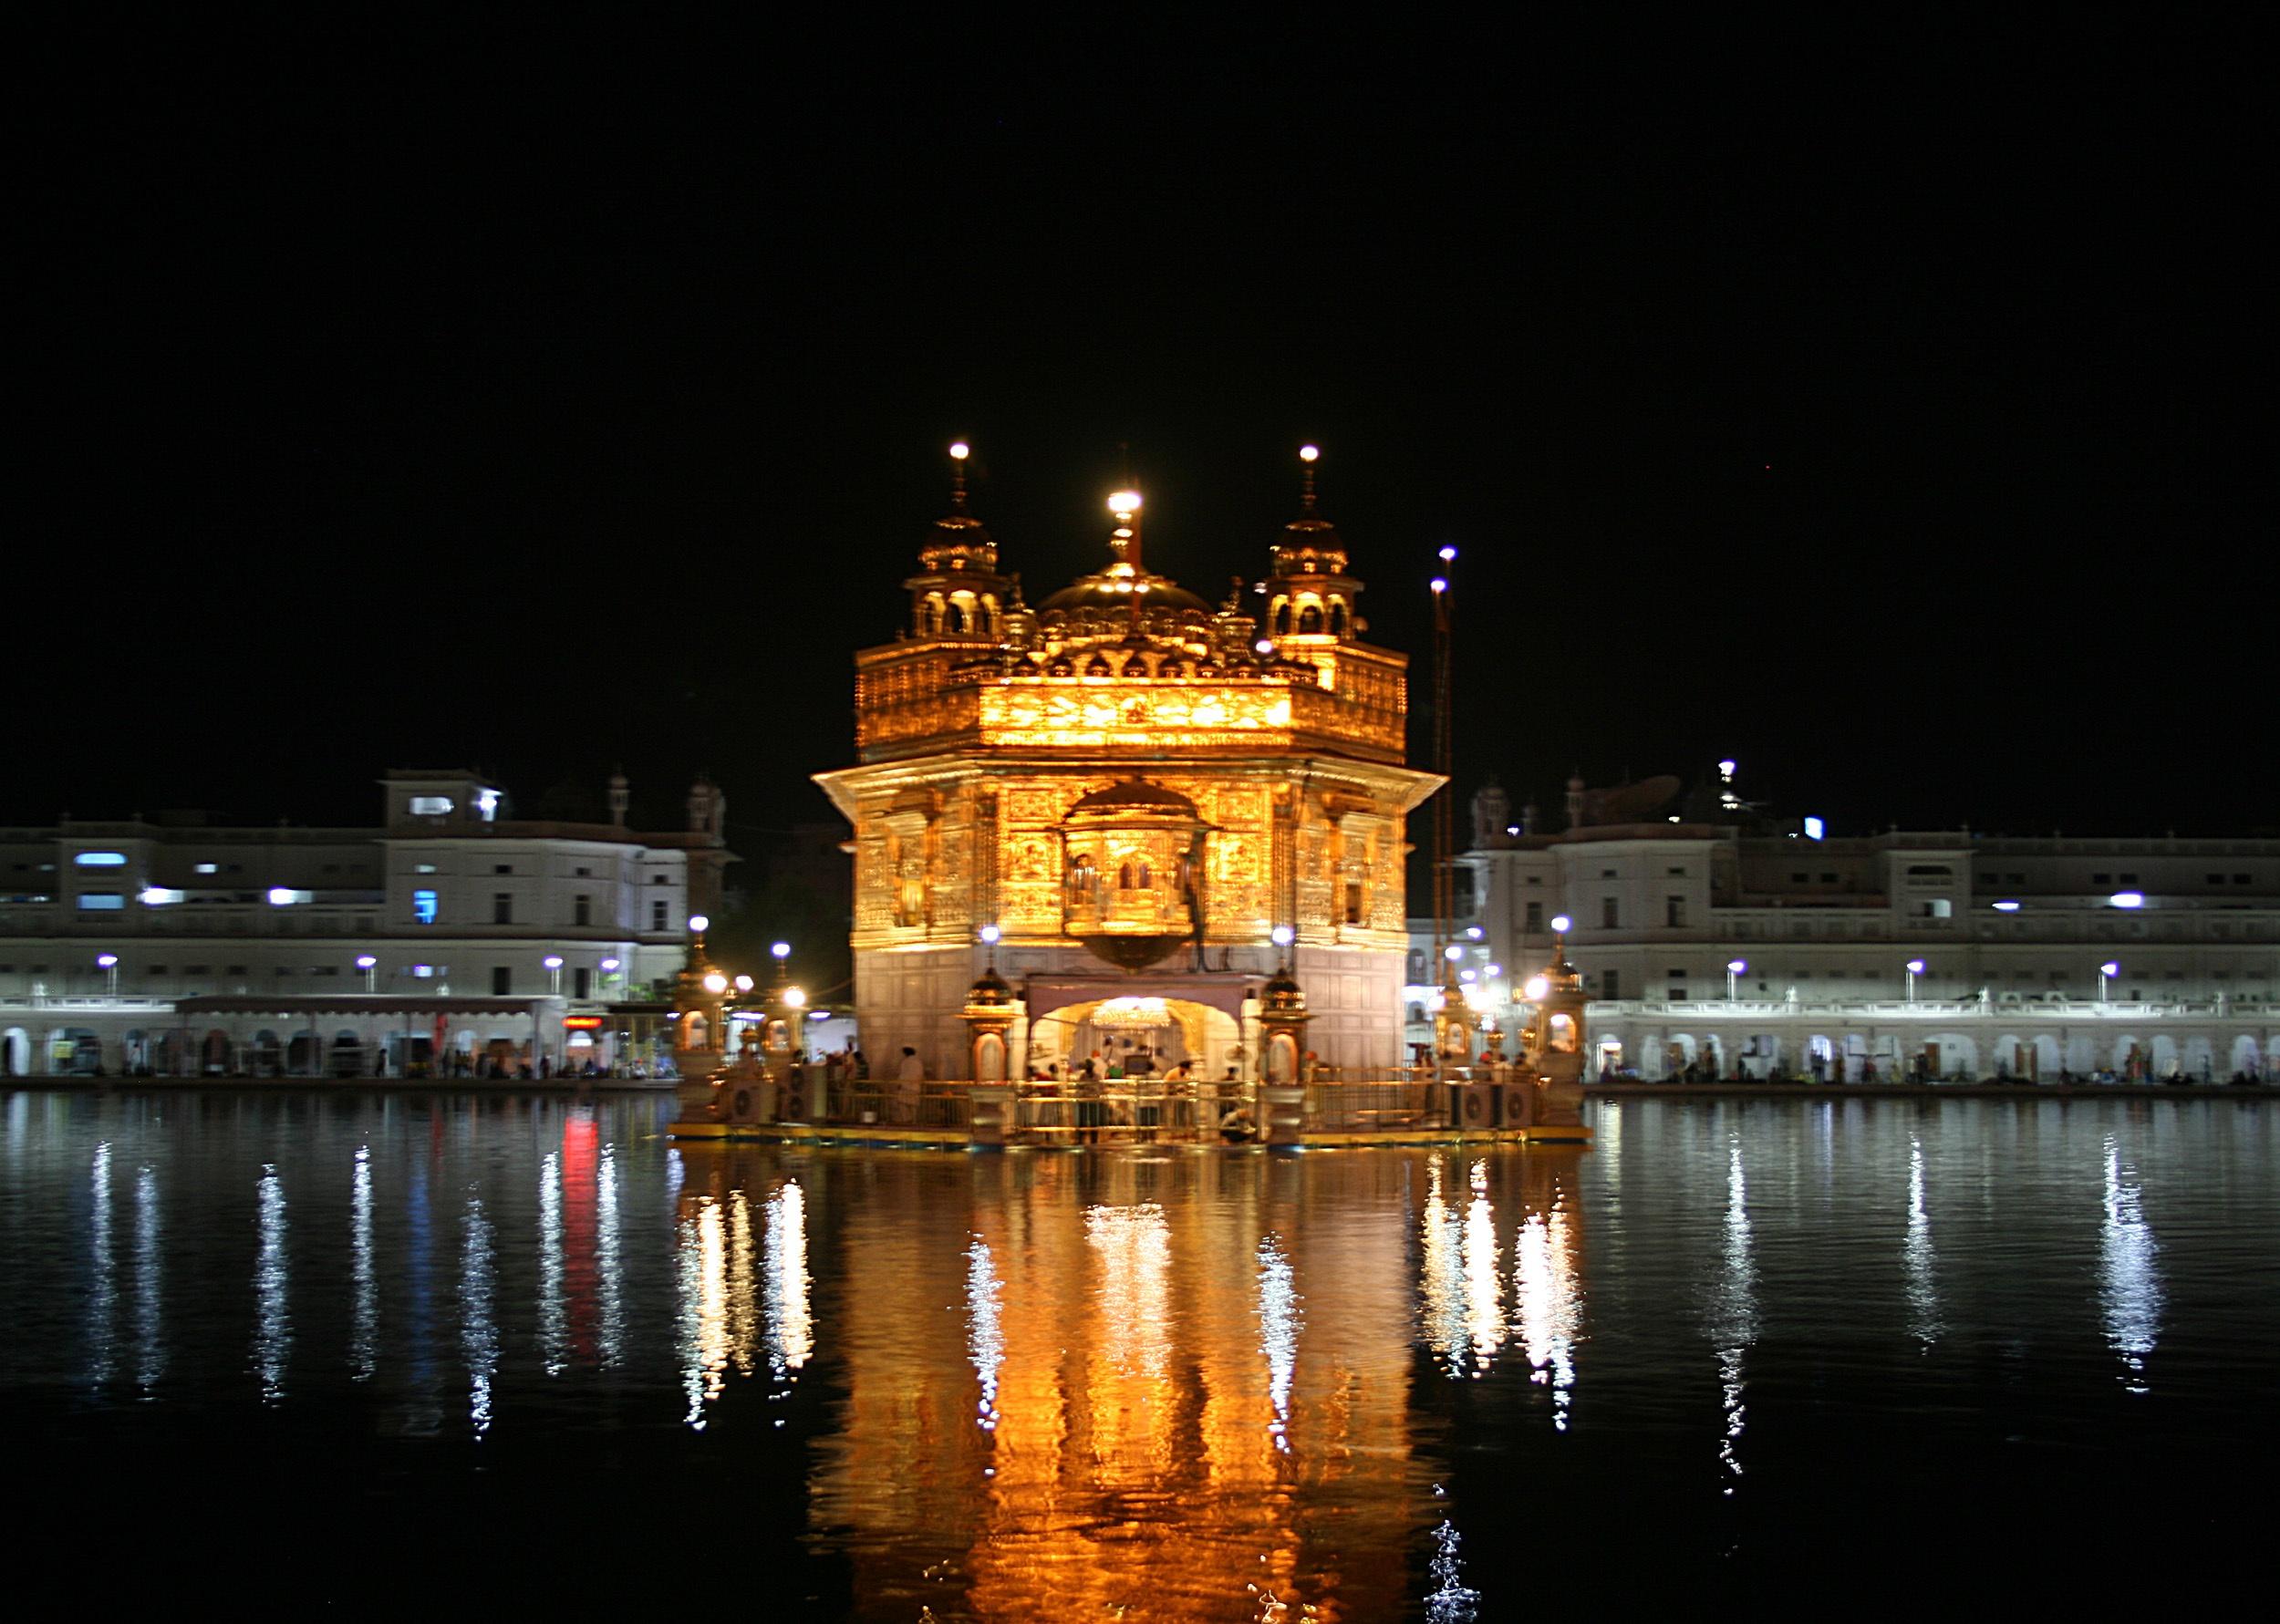 Amritsar - Il Tempio d'Oro dei Sikh